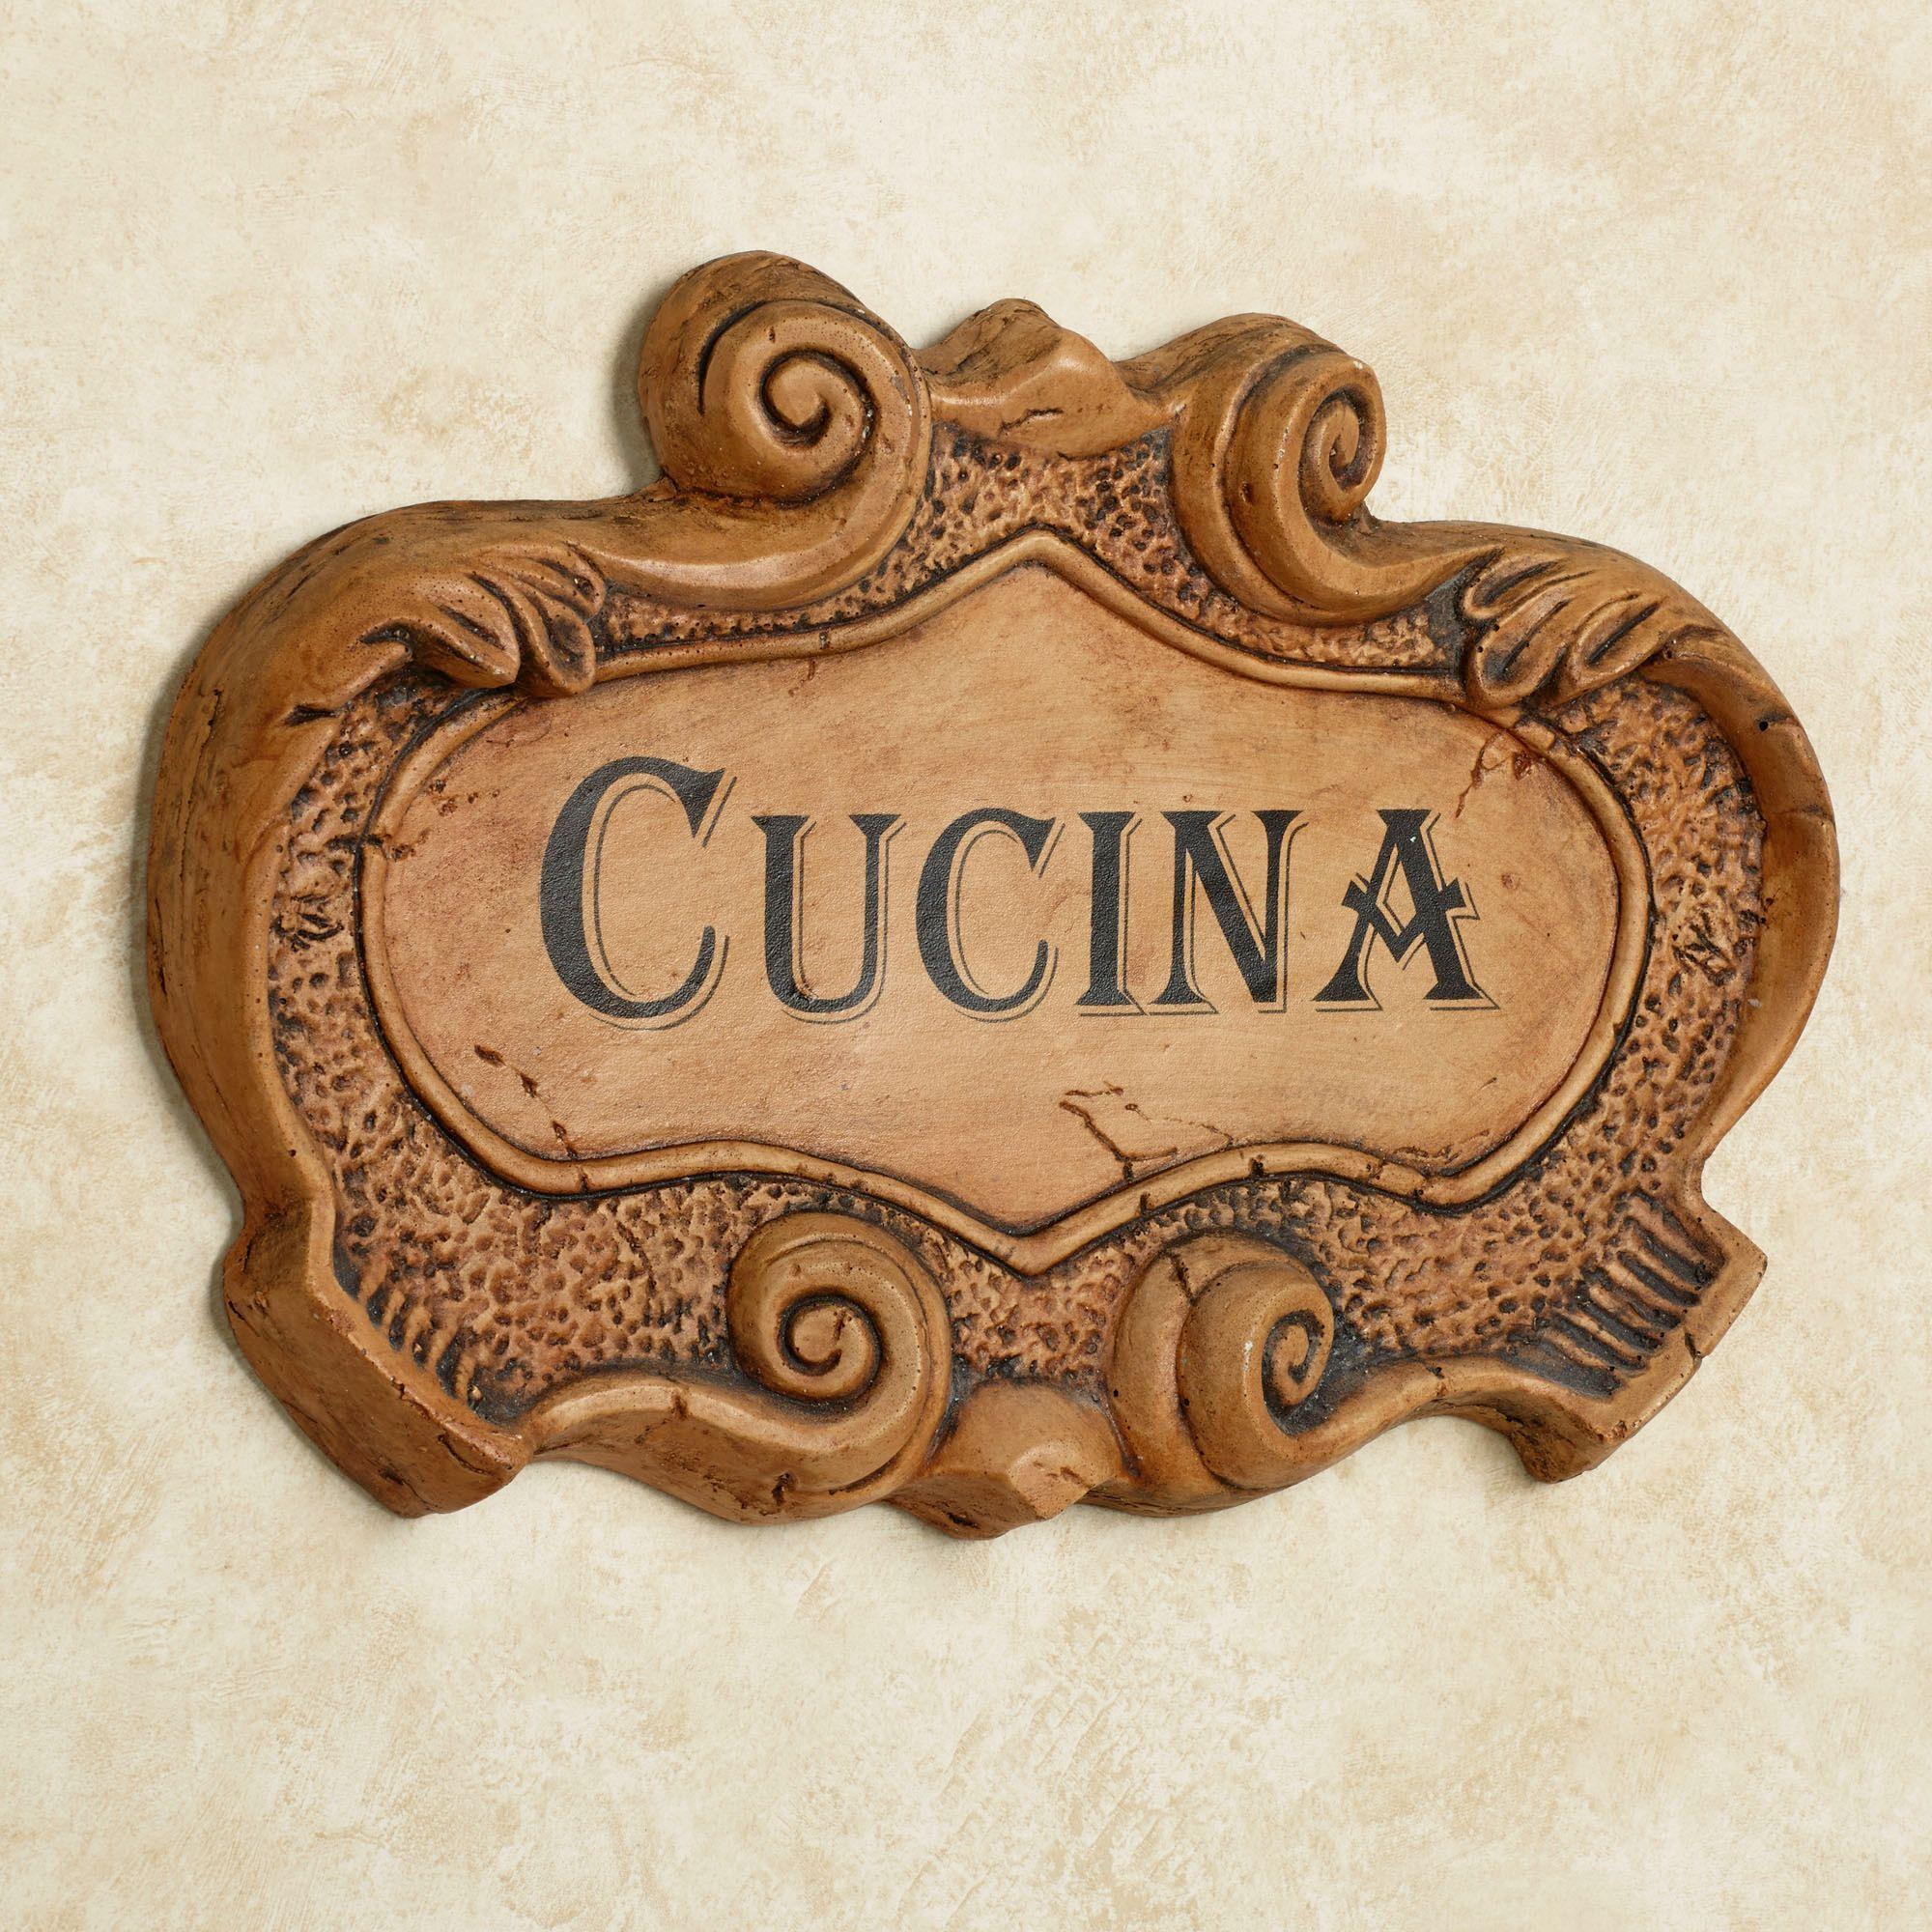 Beau Cucina Italian Kitchen Wall Plaque